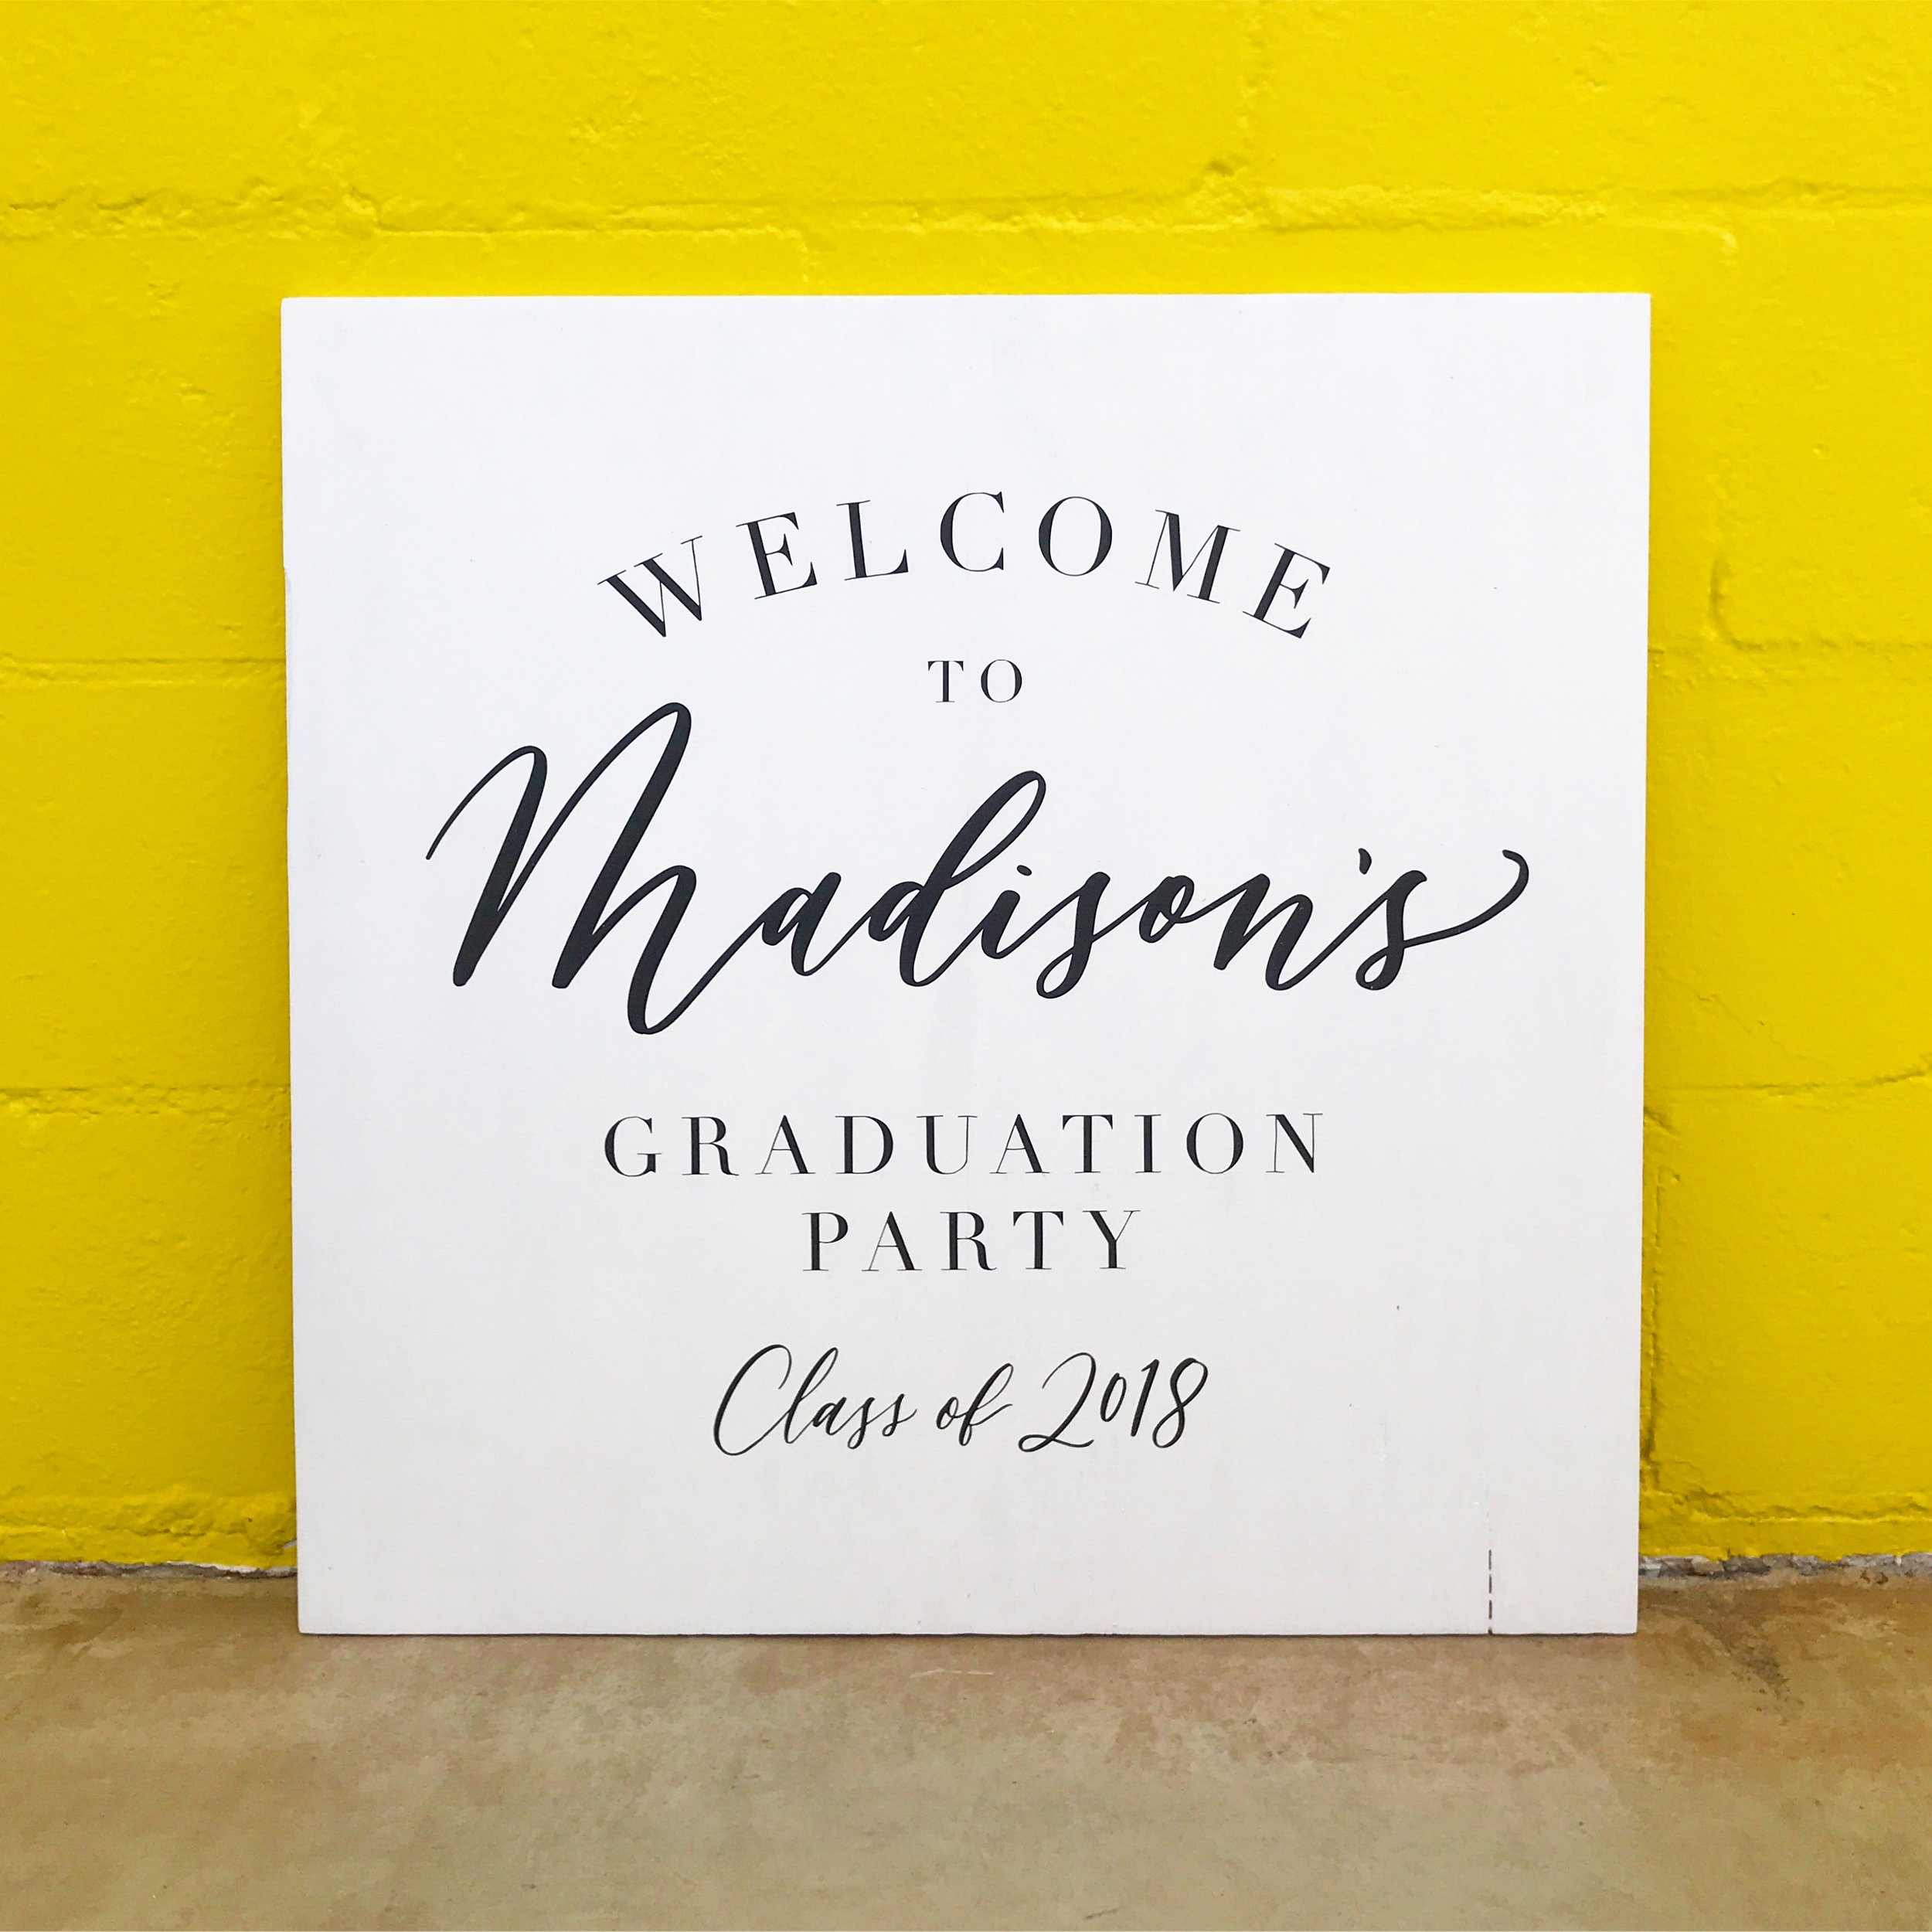 Graduation Party Signage